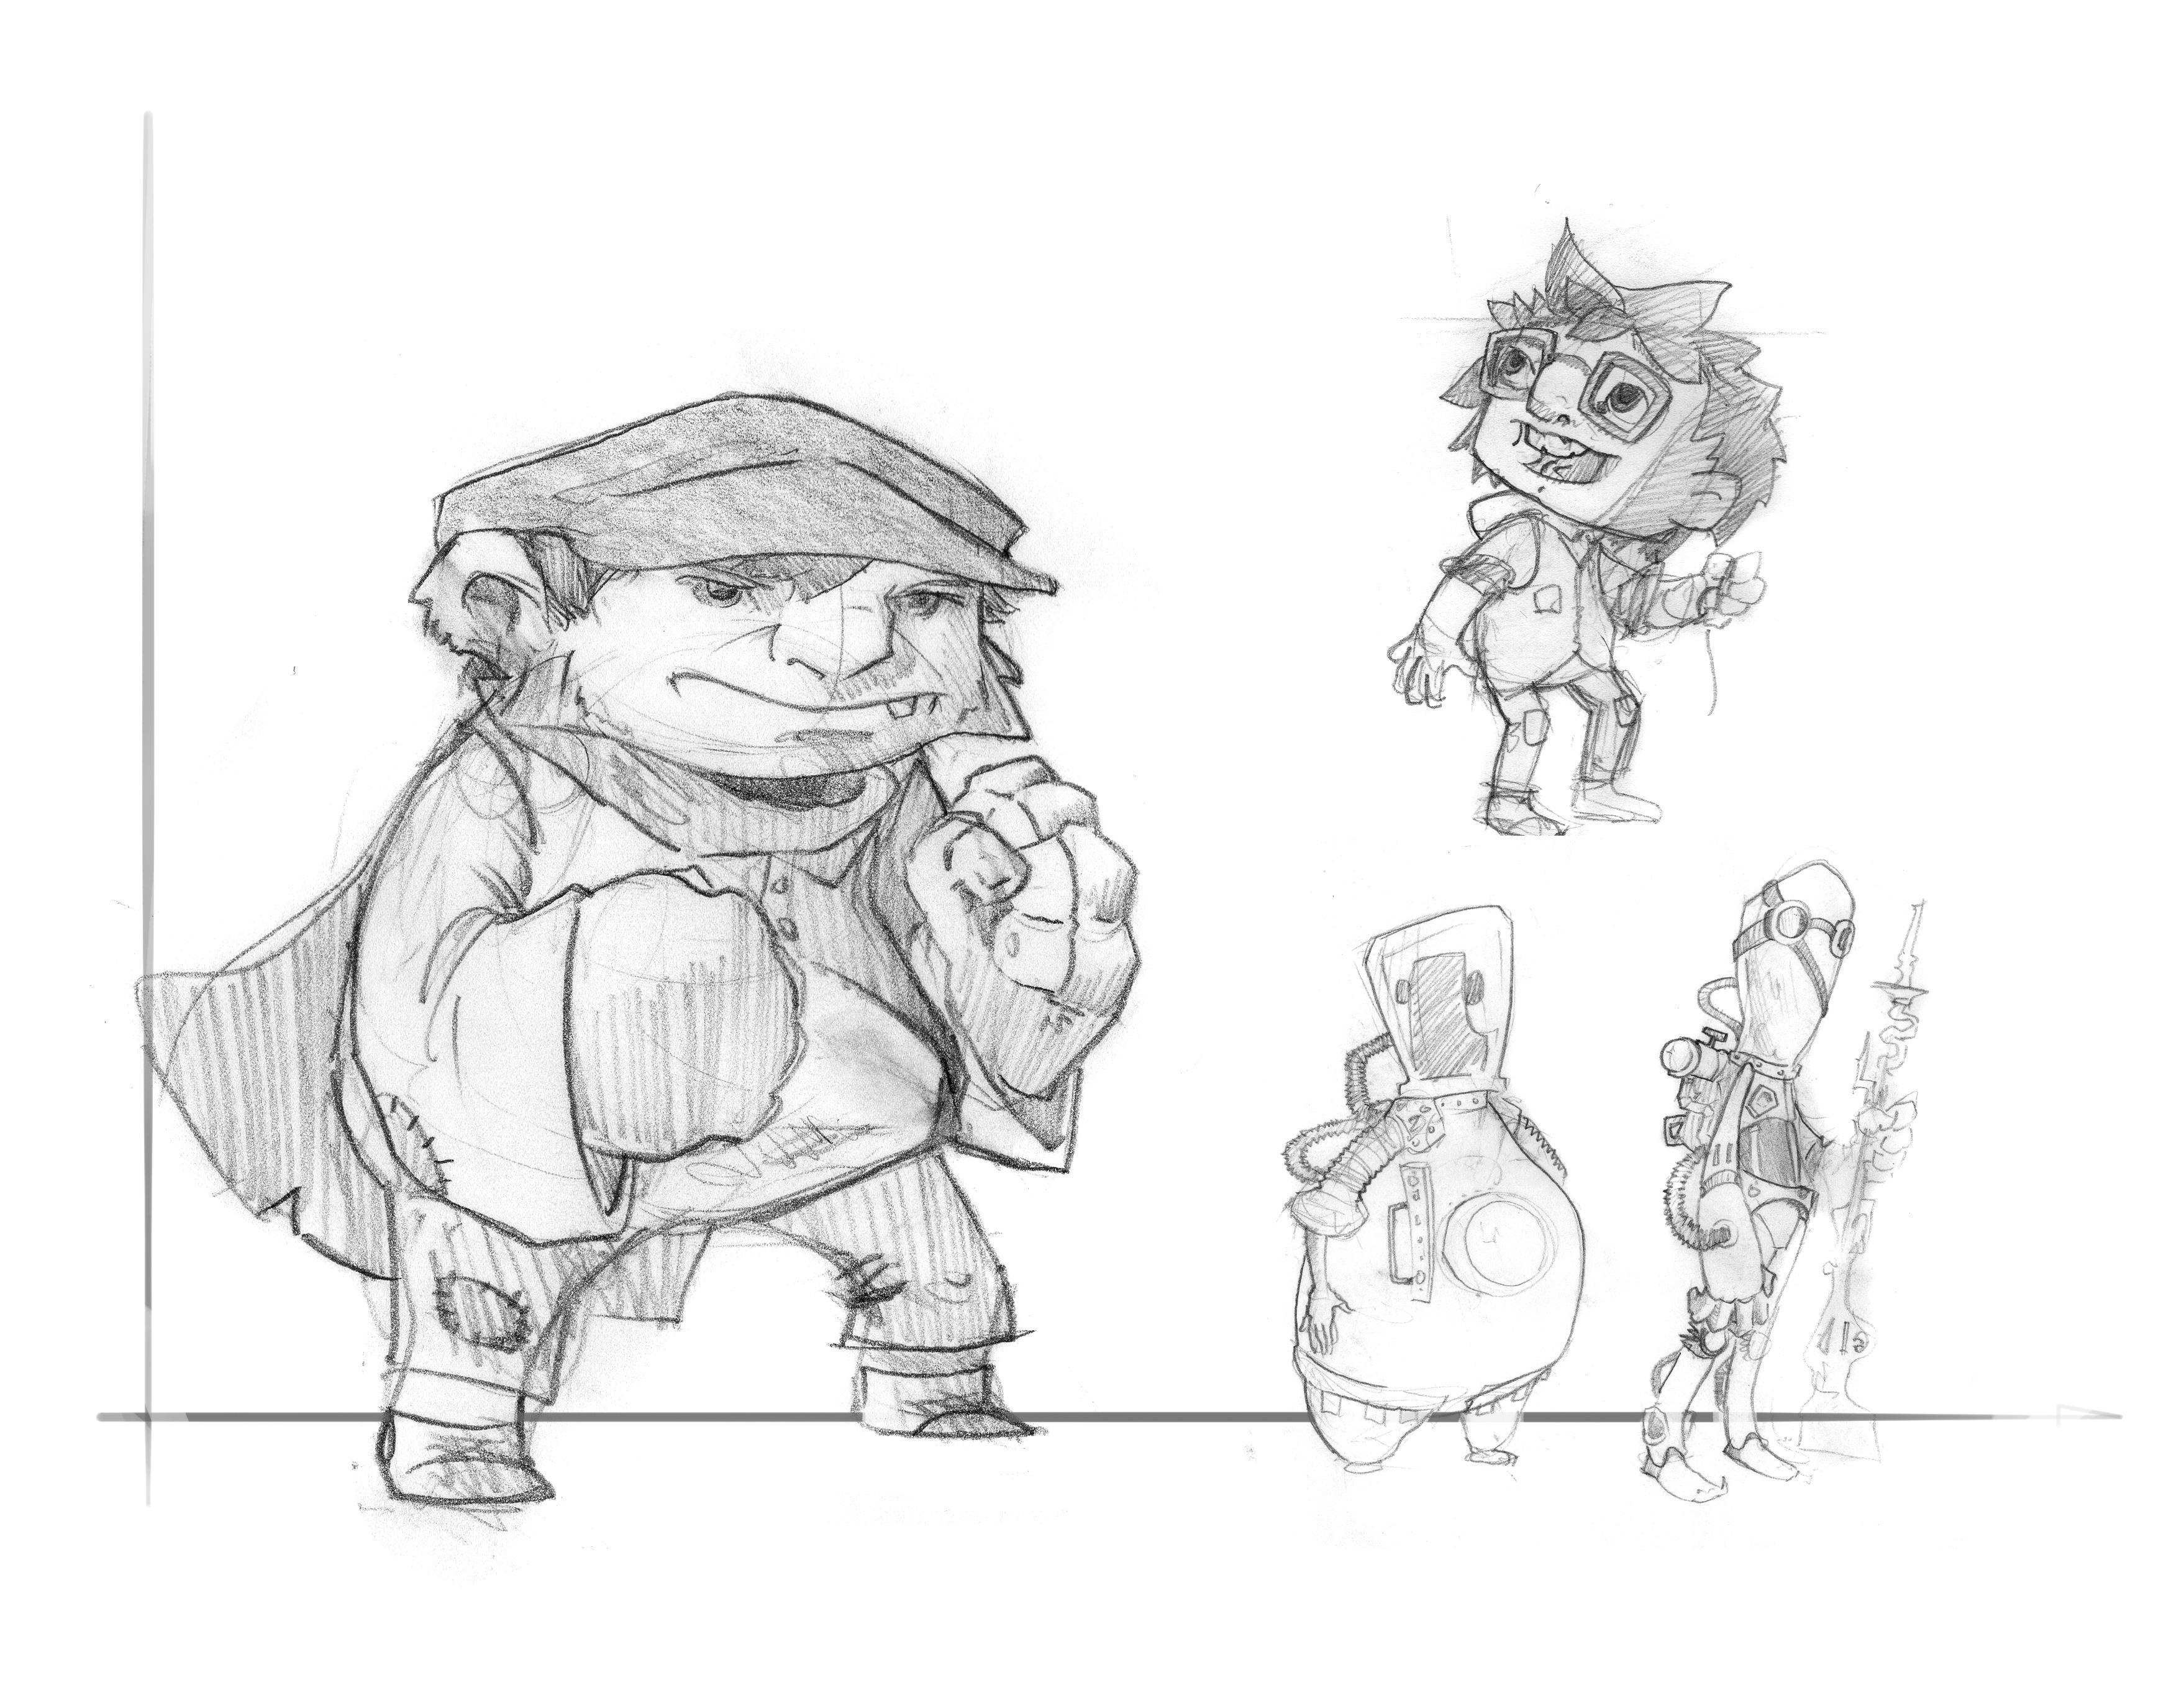 Children's Game Character Studies